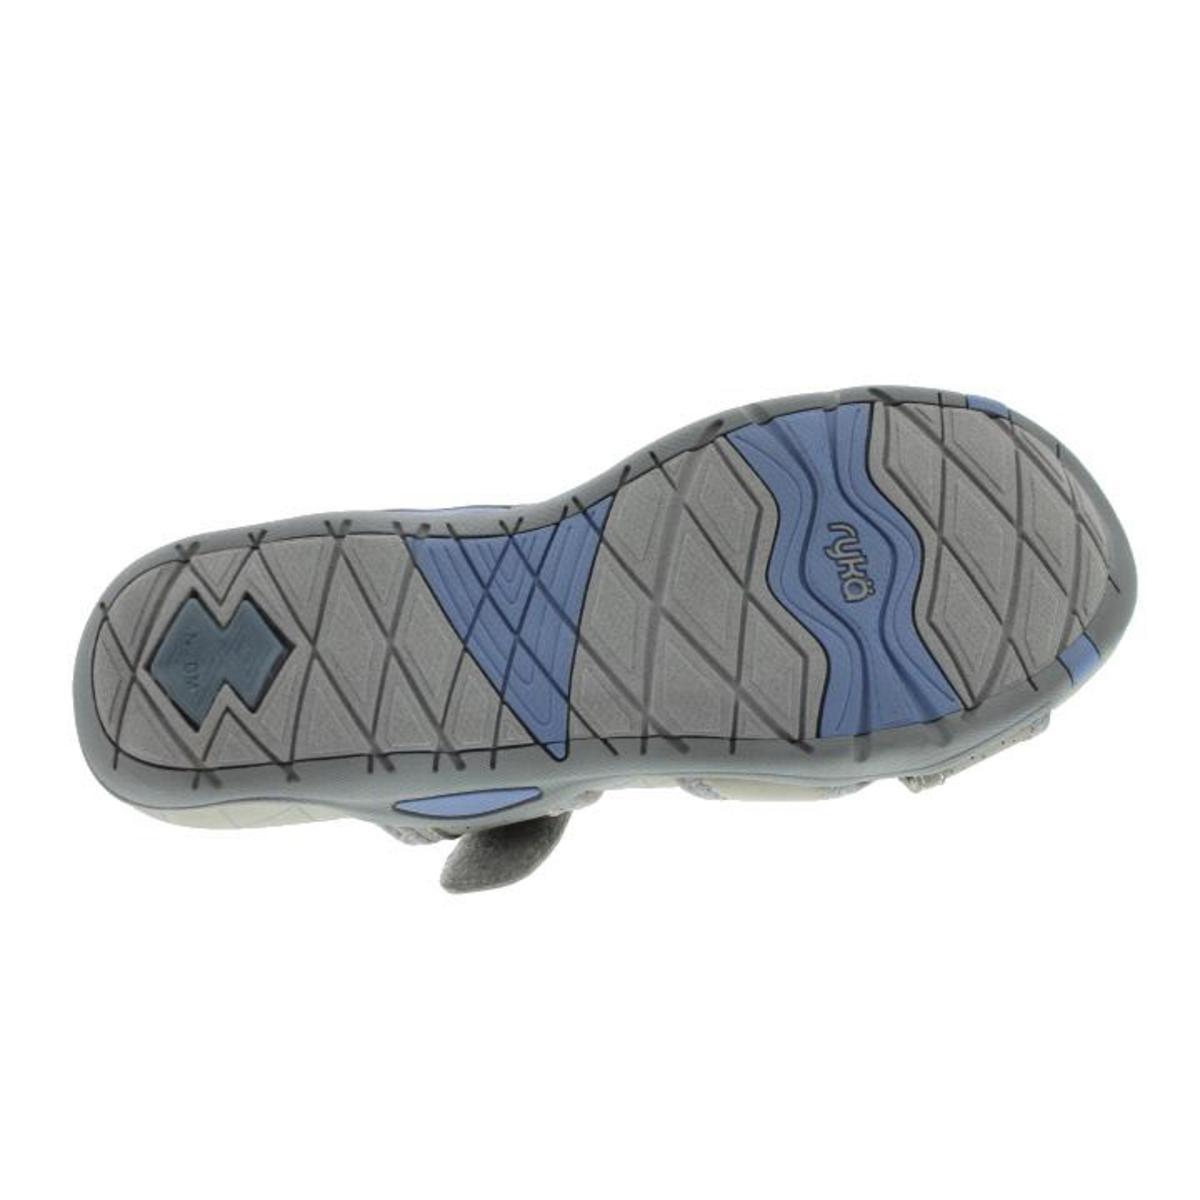 Ryka sandals shoes - Ryka 4935 Womens Essence Contrast Stitch Signature Slide